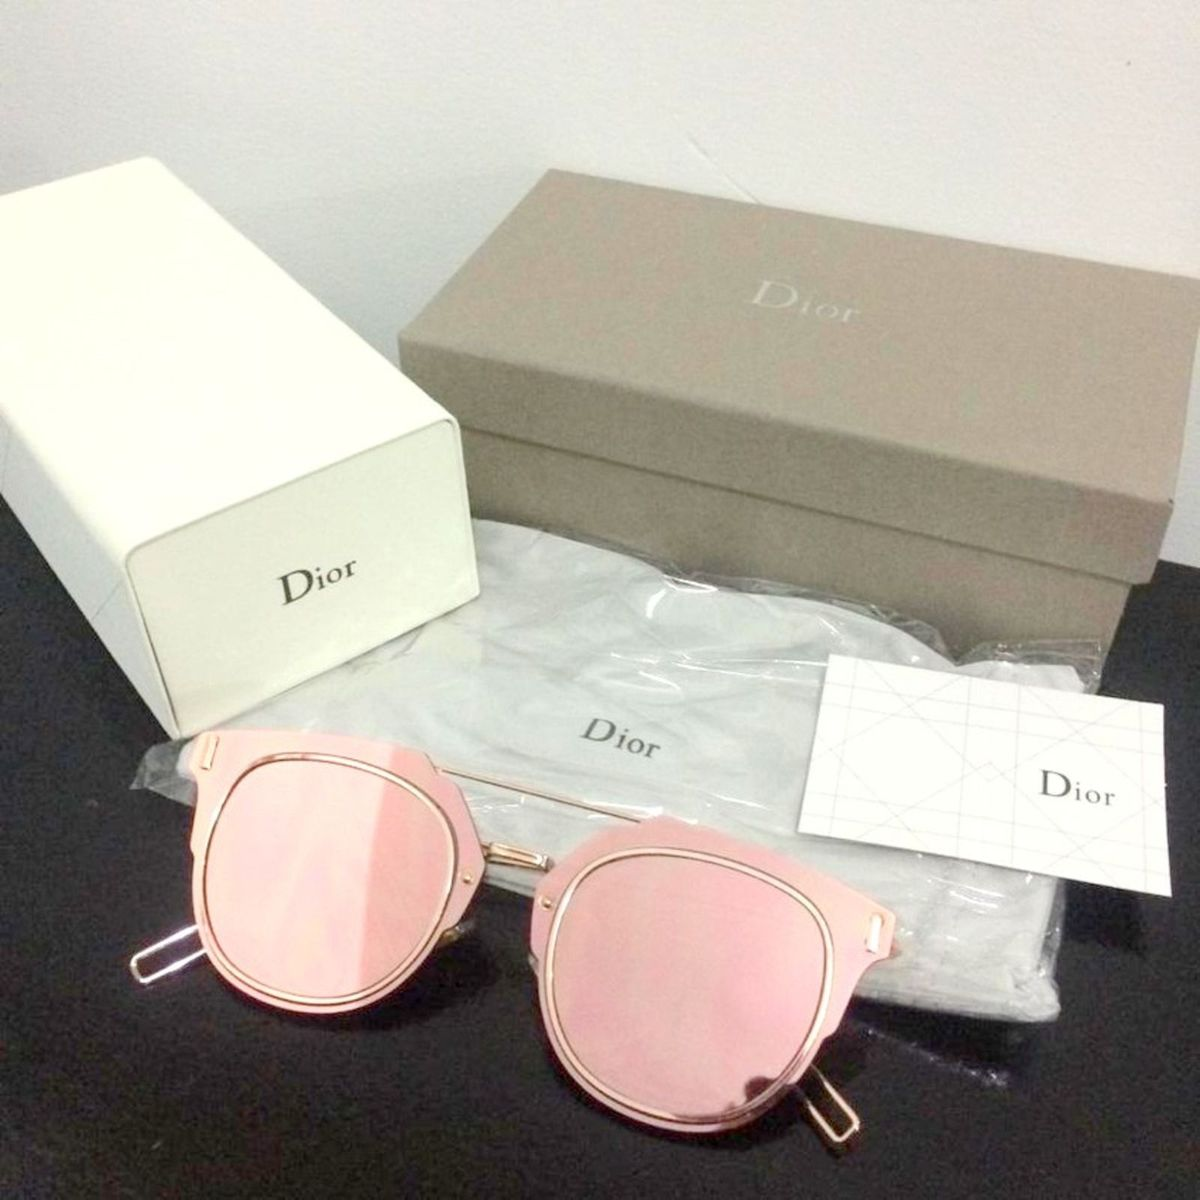 óculos dior composit 1.0 rosé - óculos dior.  Czm6ly9wag90b3muzw5qb2vplmnvbs5ici9wcm9kdwn0cy83mje5njcvzjniogu2mdc1njlmyty0njy1zwvkzmeyyjdknmiyy2yuanbn  ... f28522bbb1